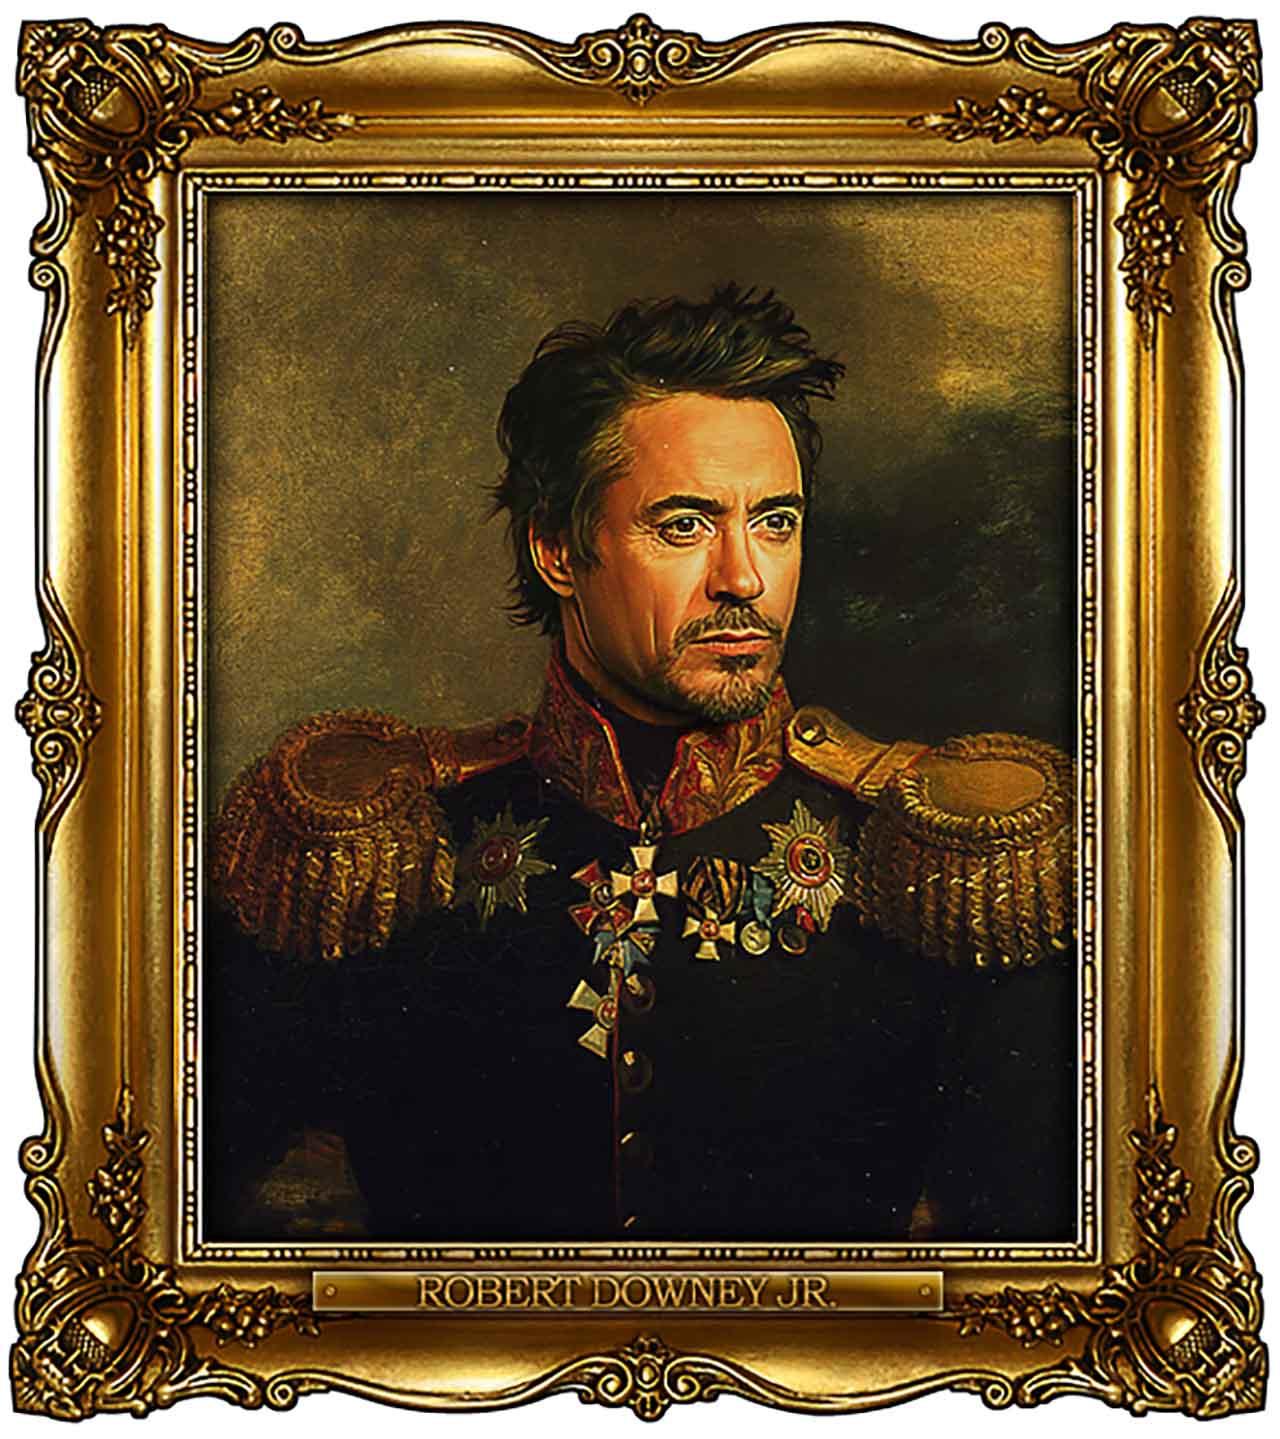 Artist Turns Famous Actors Into Russian Generals - Robert Downey Jr.